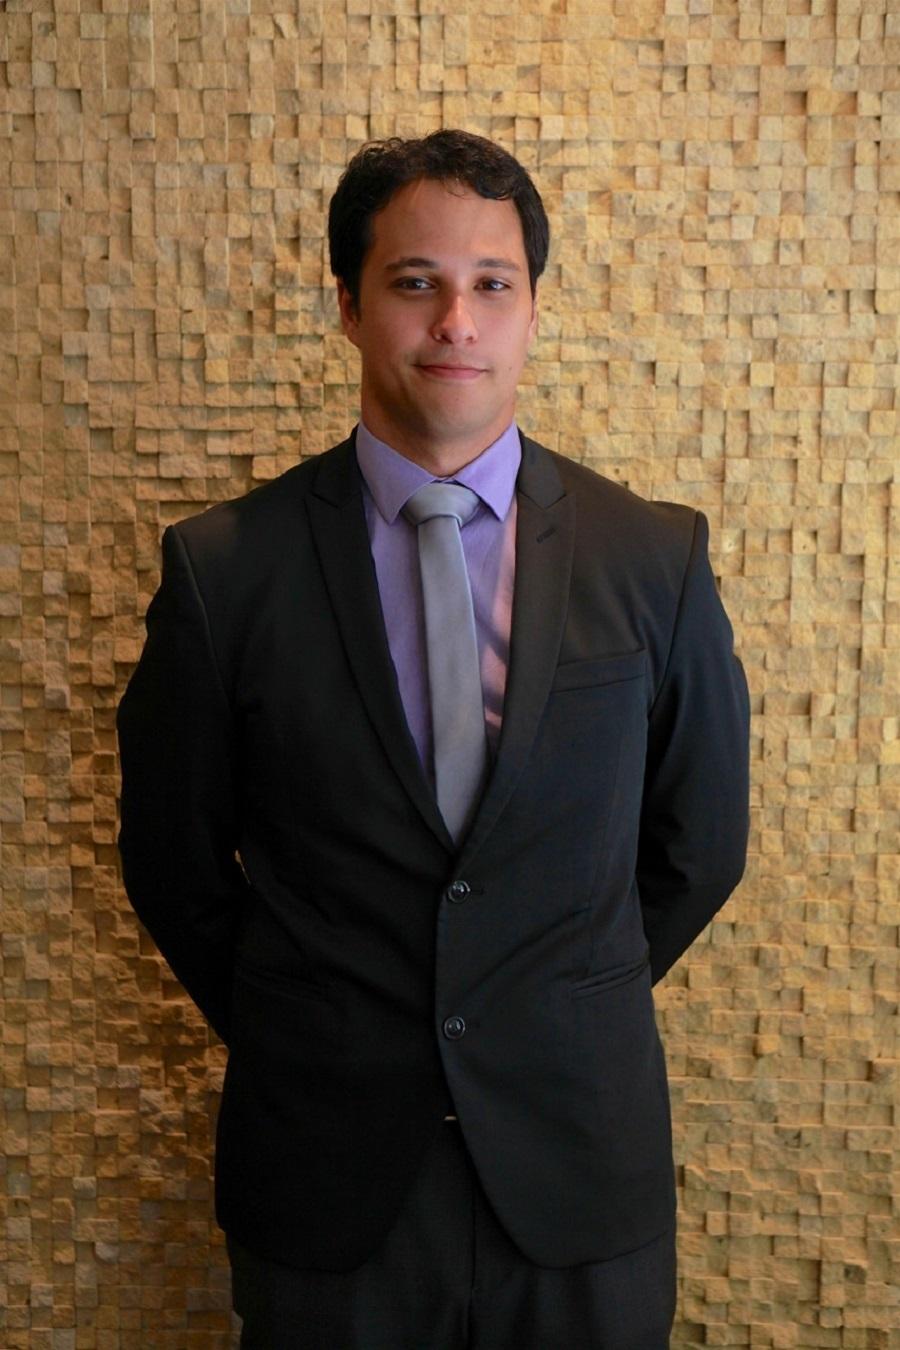 Tim Benito